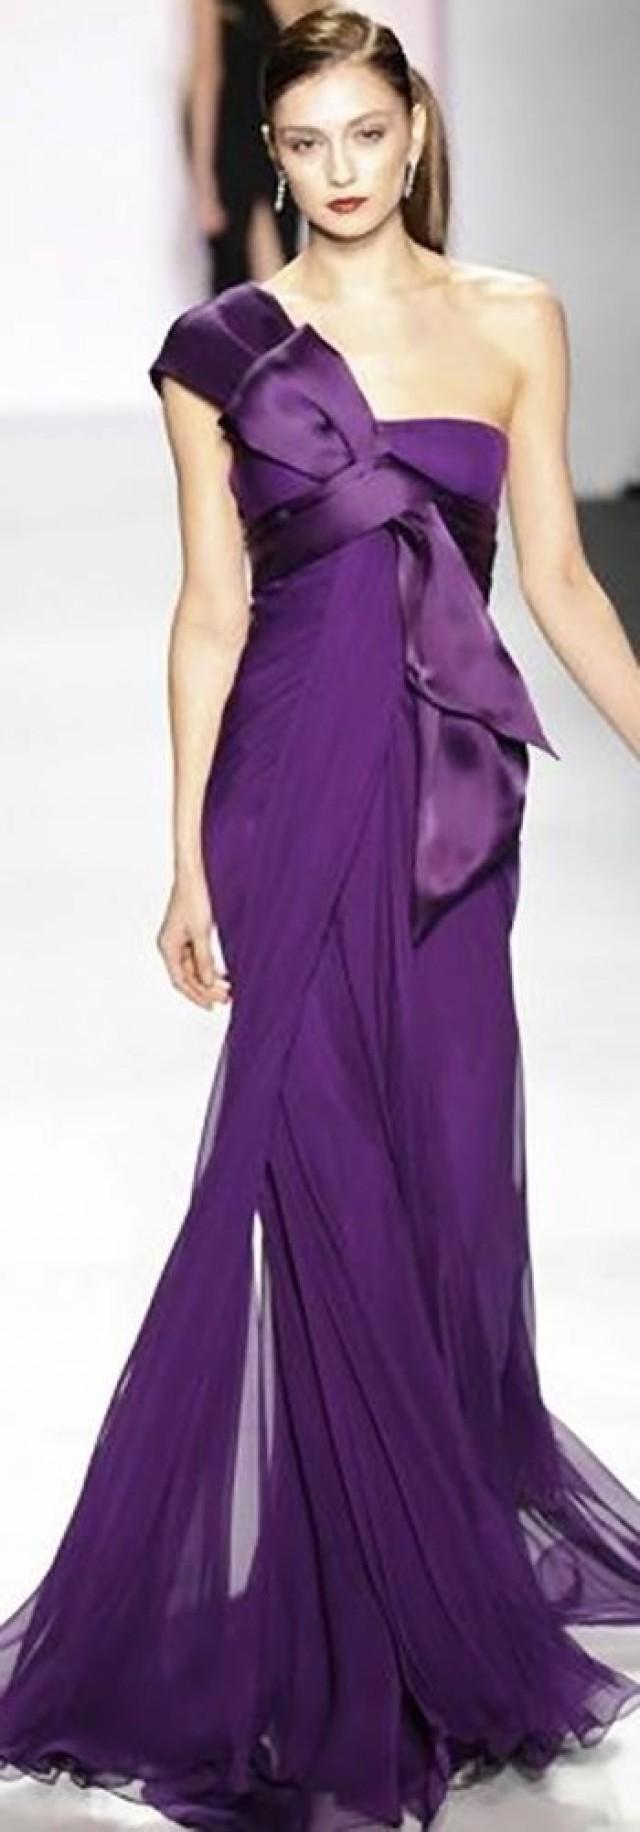 wedding photo - Stunning Purple Dress